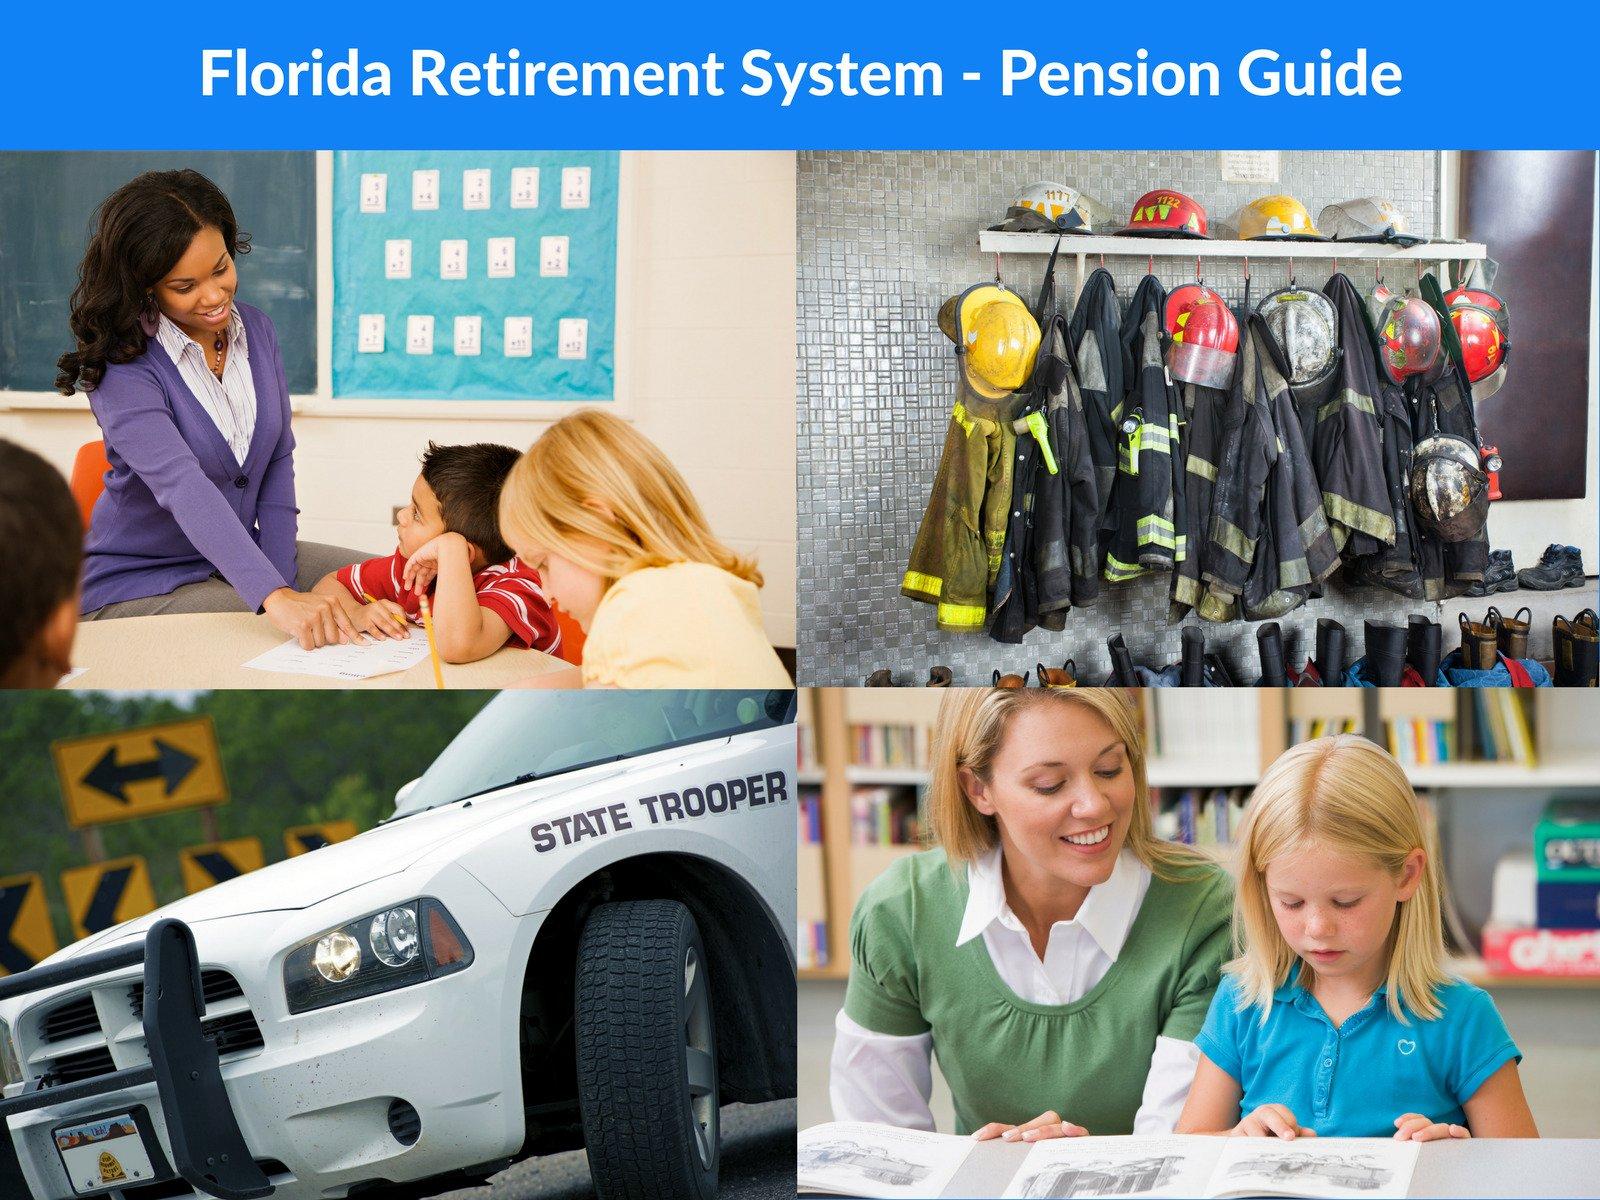 Florida Retirement System - Pension Guide - Season 1